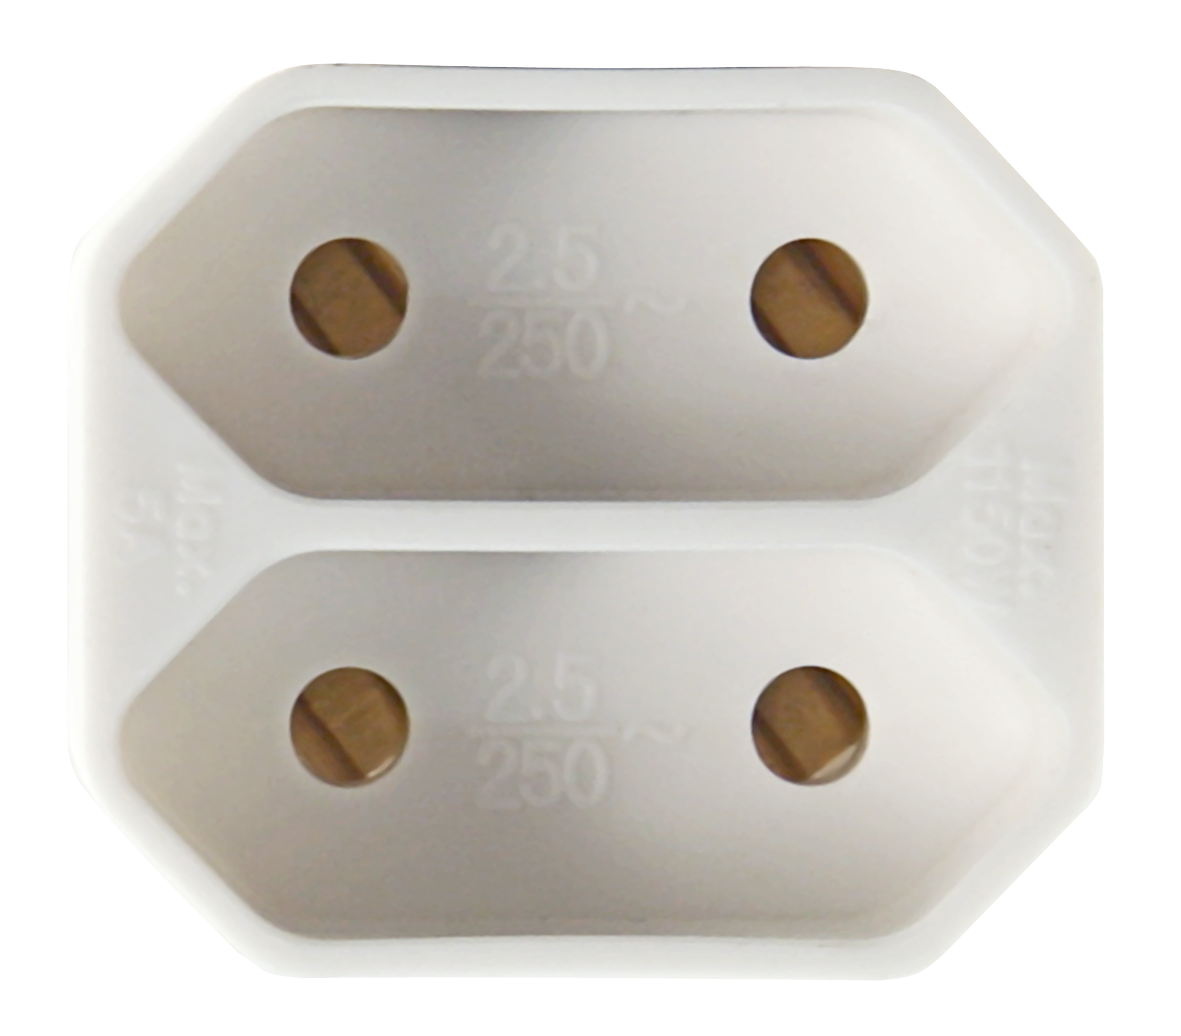 Steckdosenadapter McPower, 2x Euro, weiß